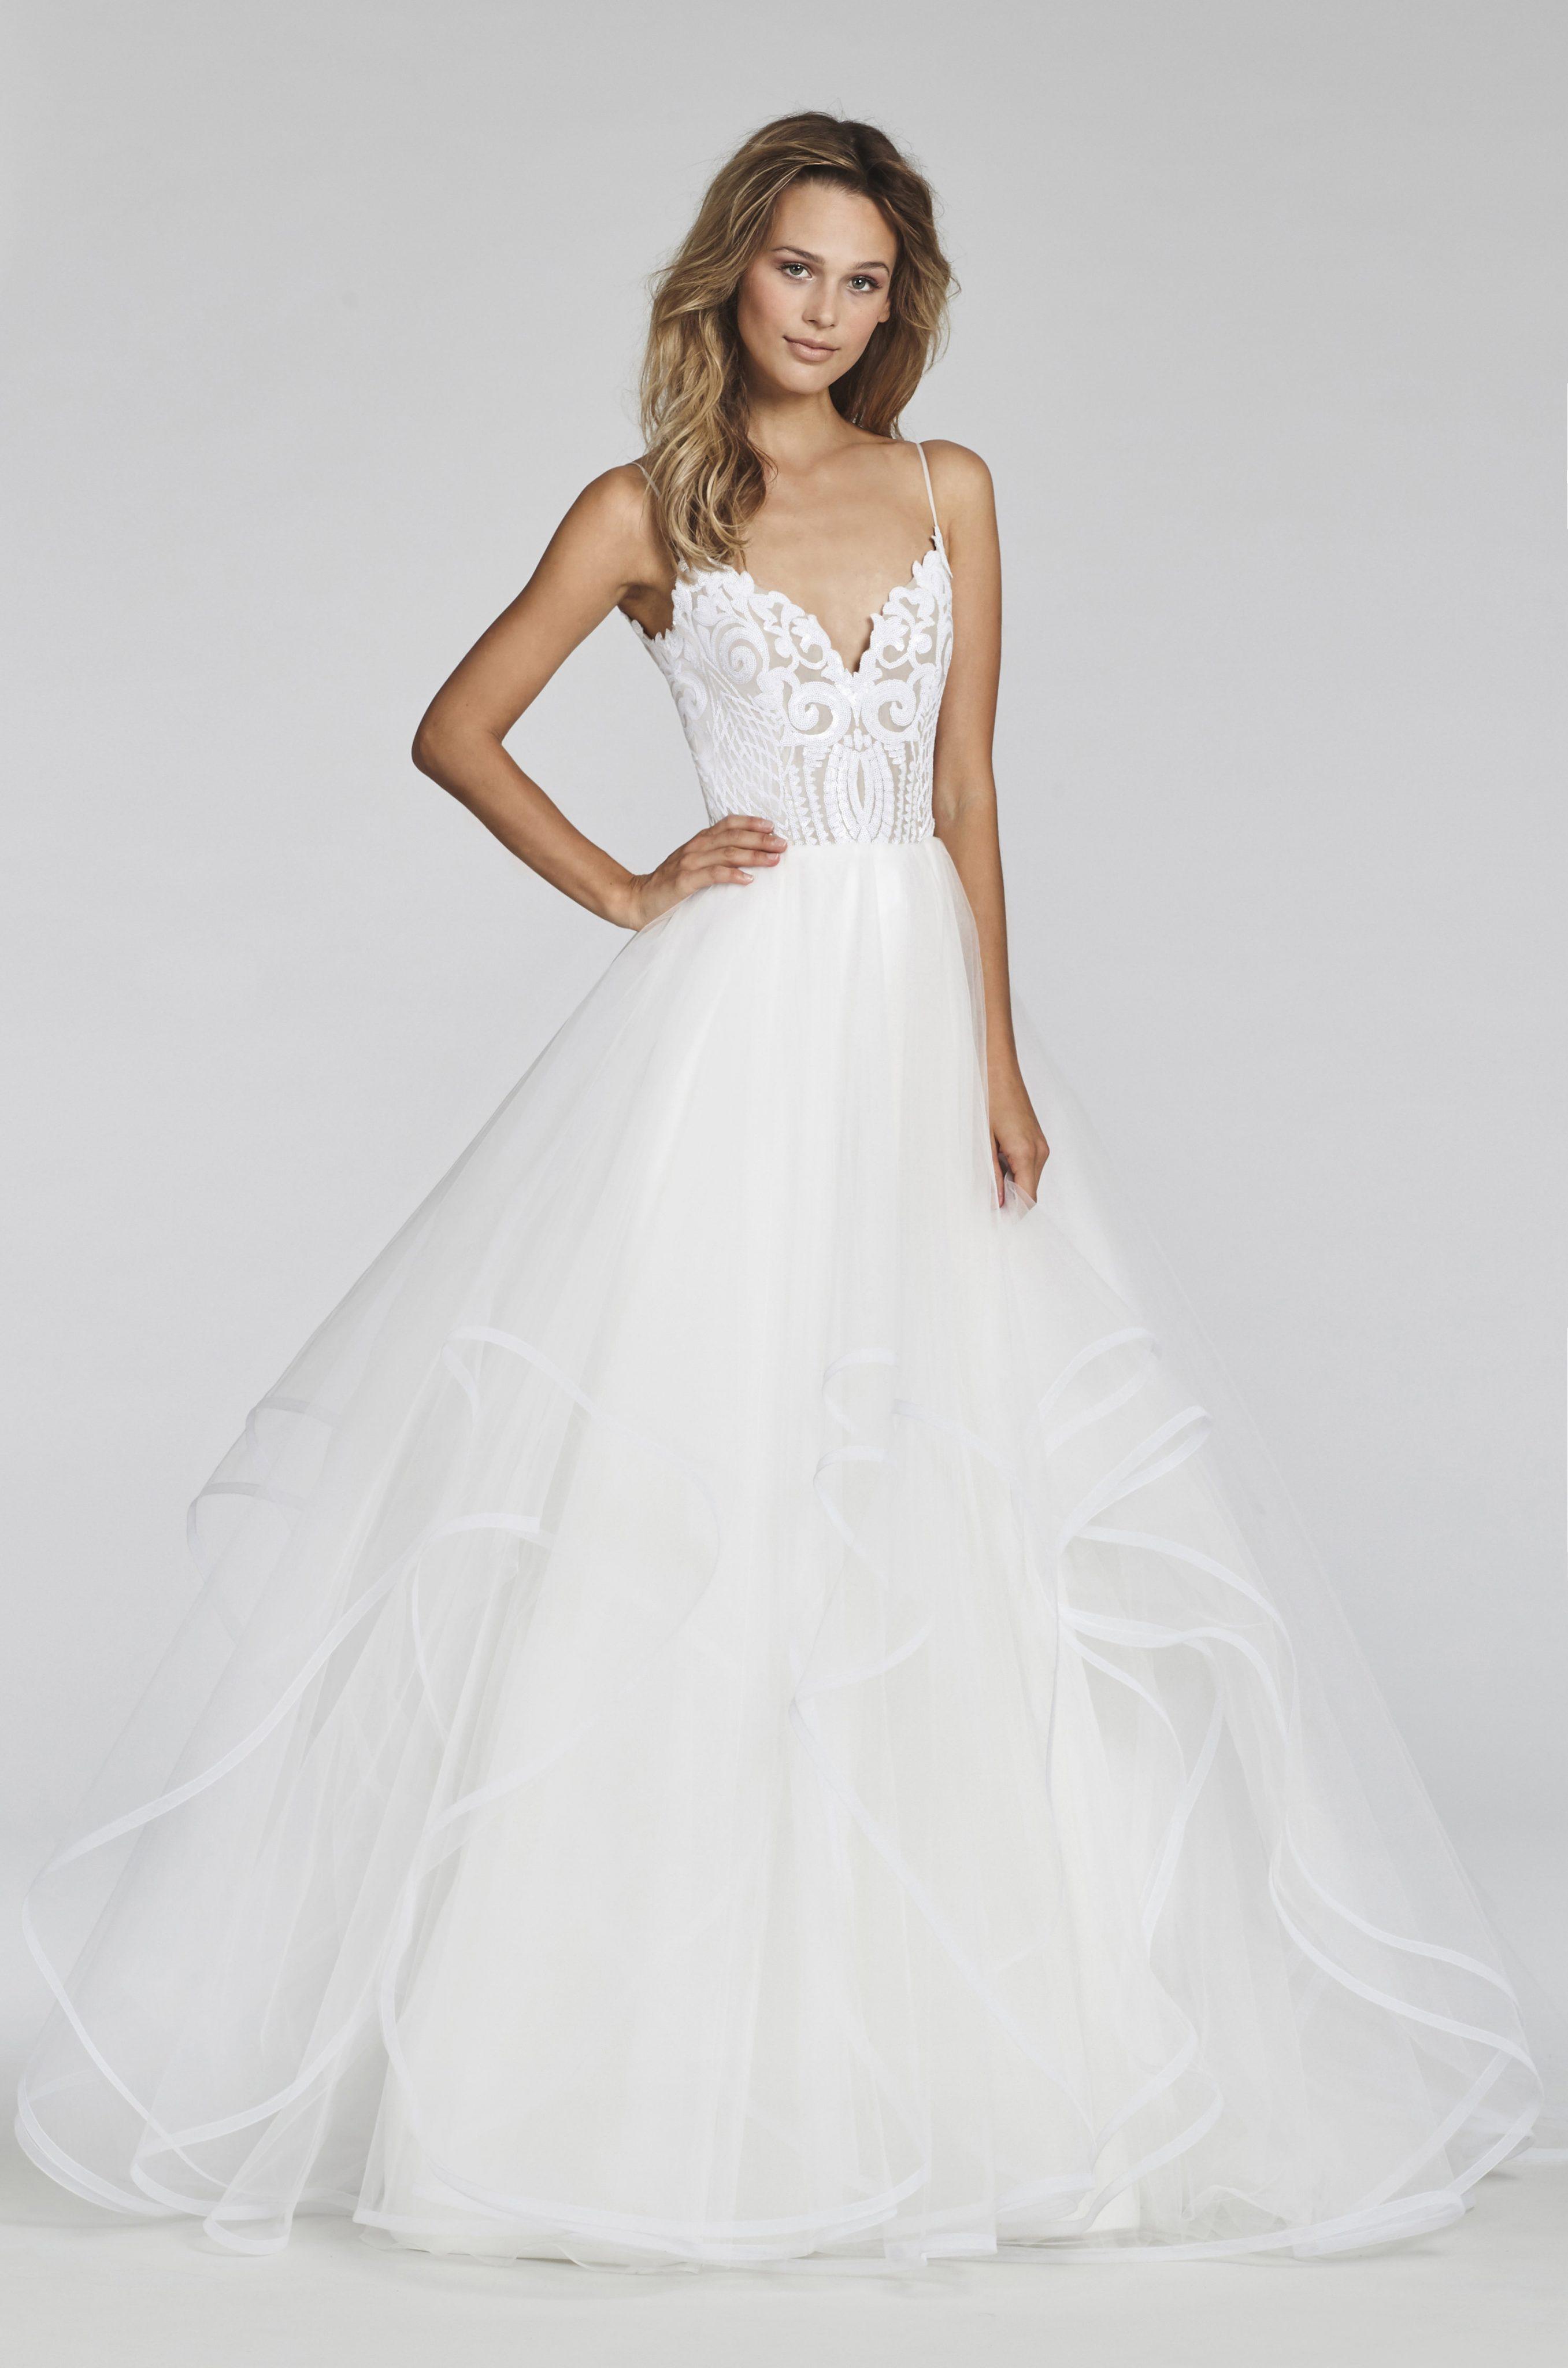 Spaghetti Strap Beaded Bodice Ball Gown Wedding Dress